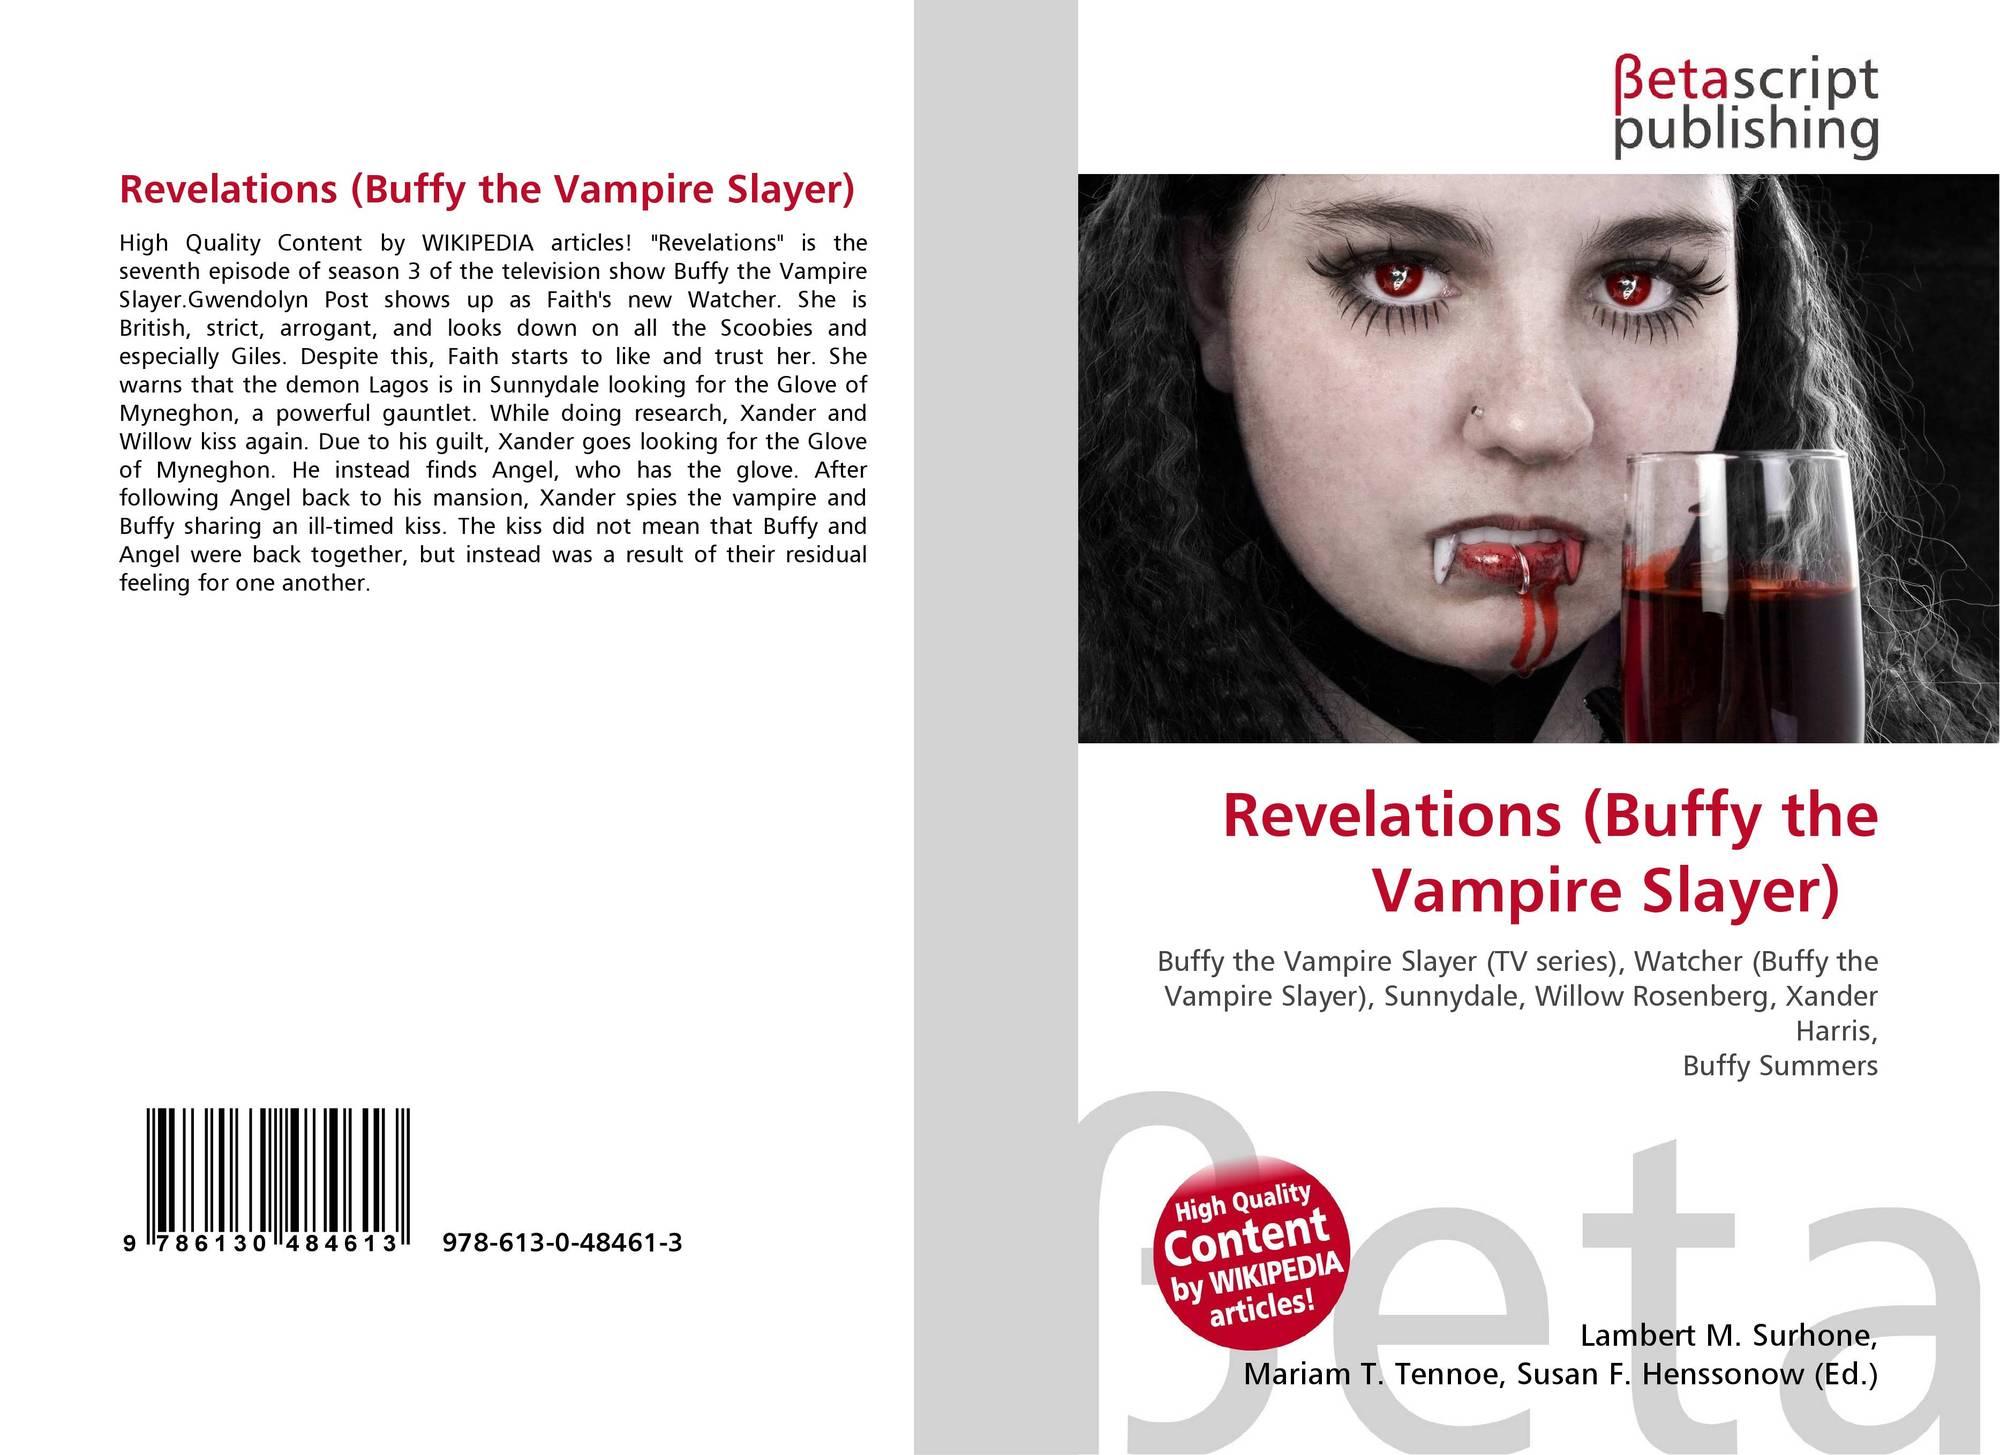 Girl's from buffy the vampire slayer in  erotic clips